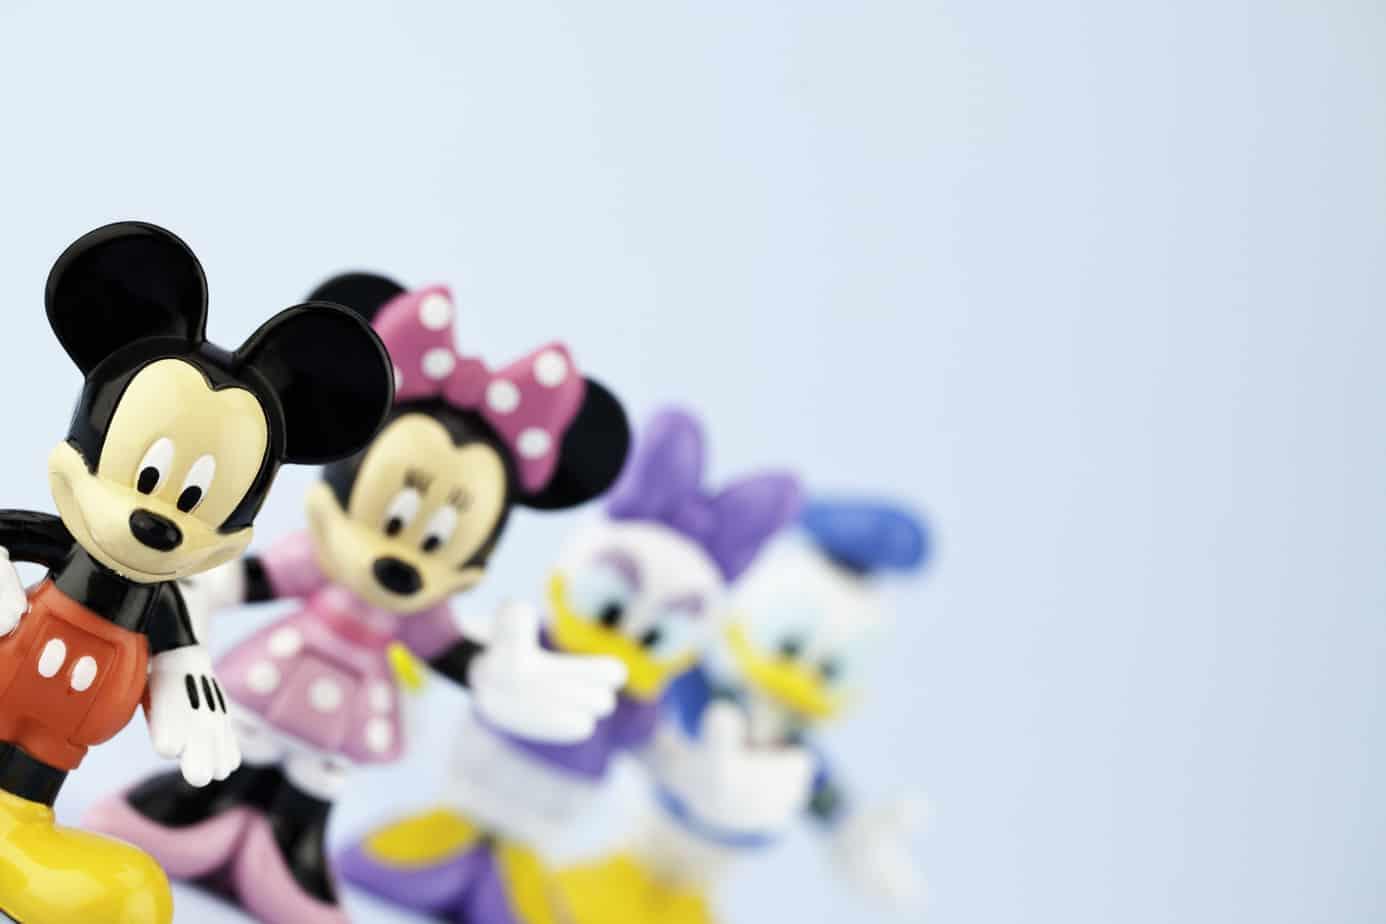 FNE busca multa por infracción a régimen de fusiones - contra Disney